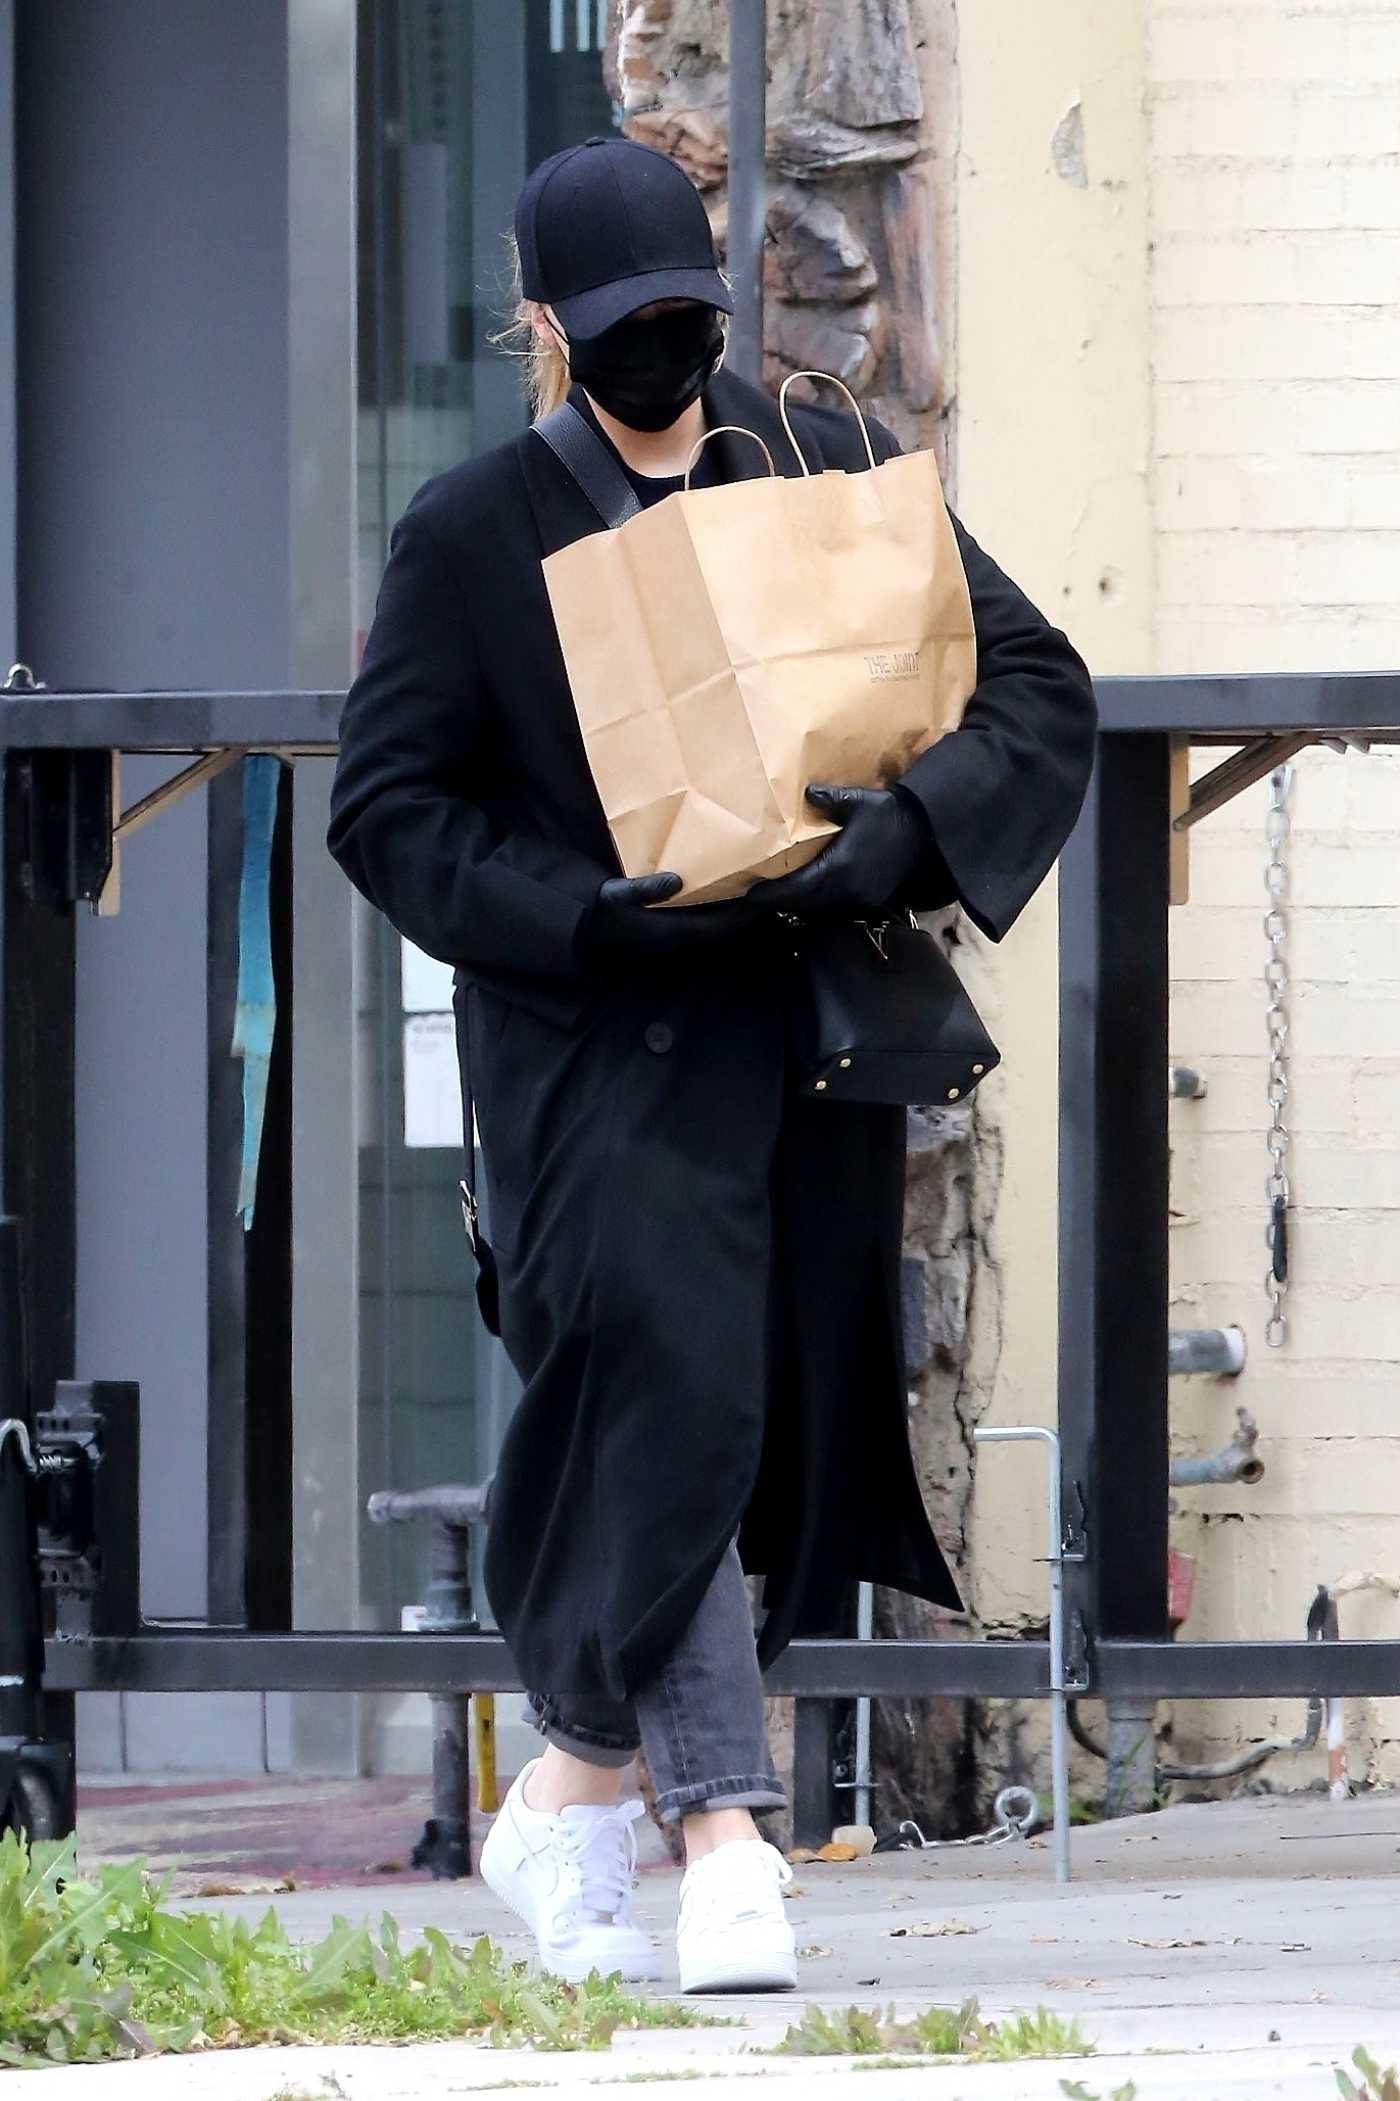 Chloe Moretz in a Black Face Mask Goes Shopping in Studio City 04/08/2020